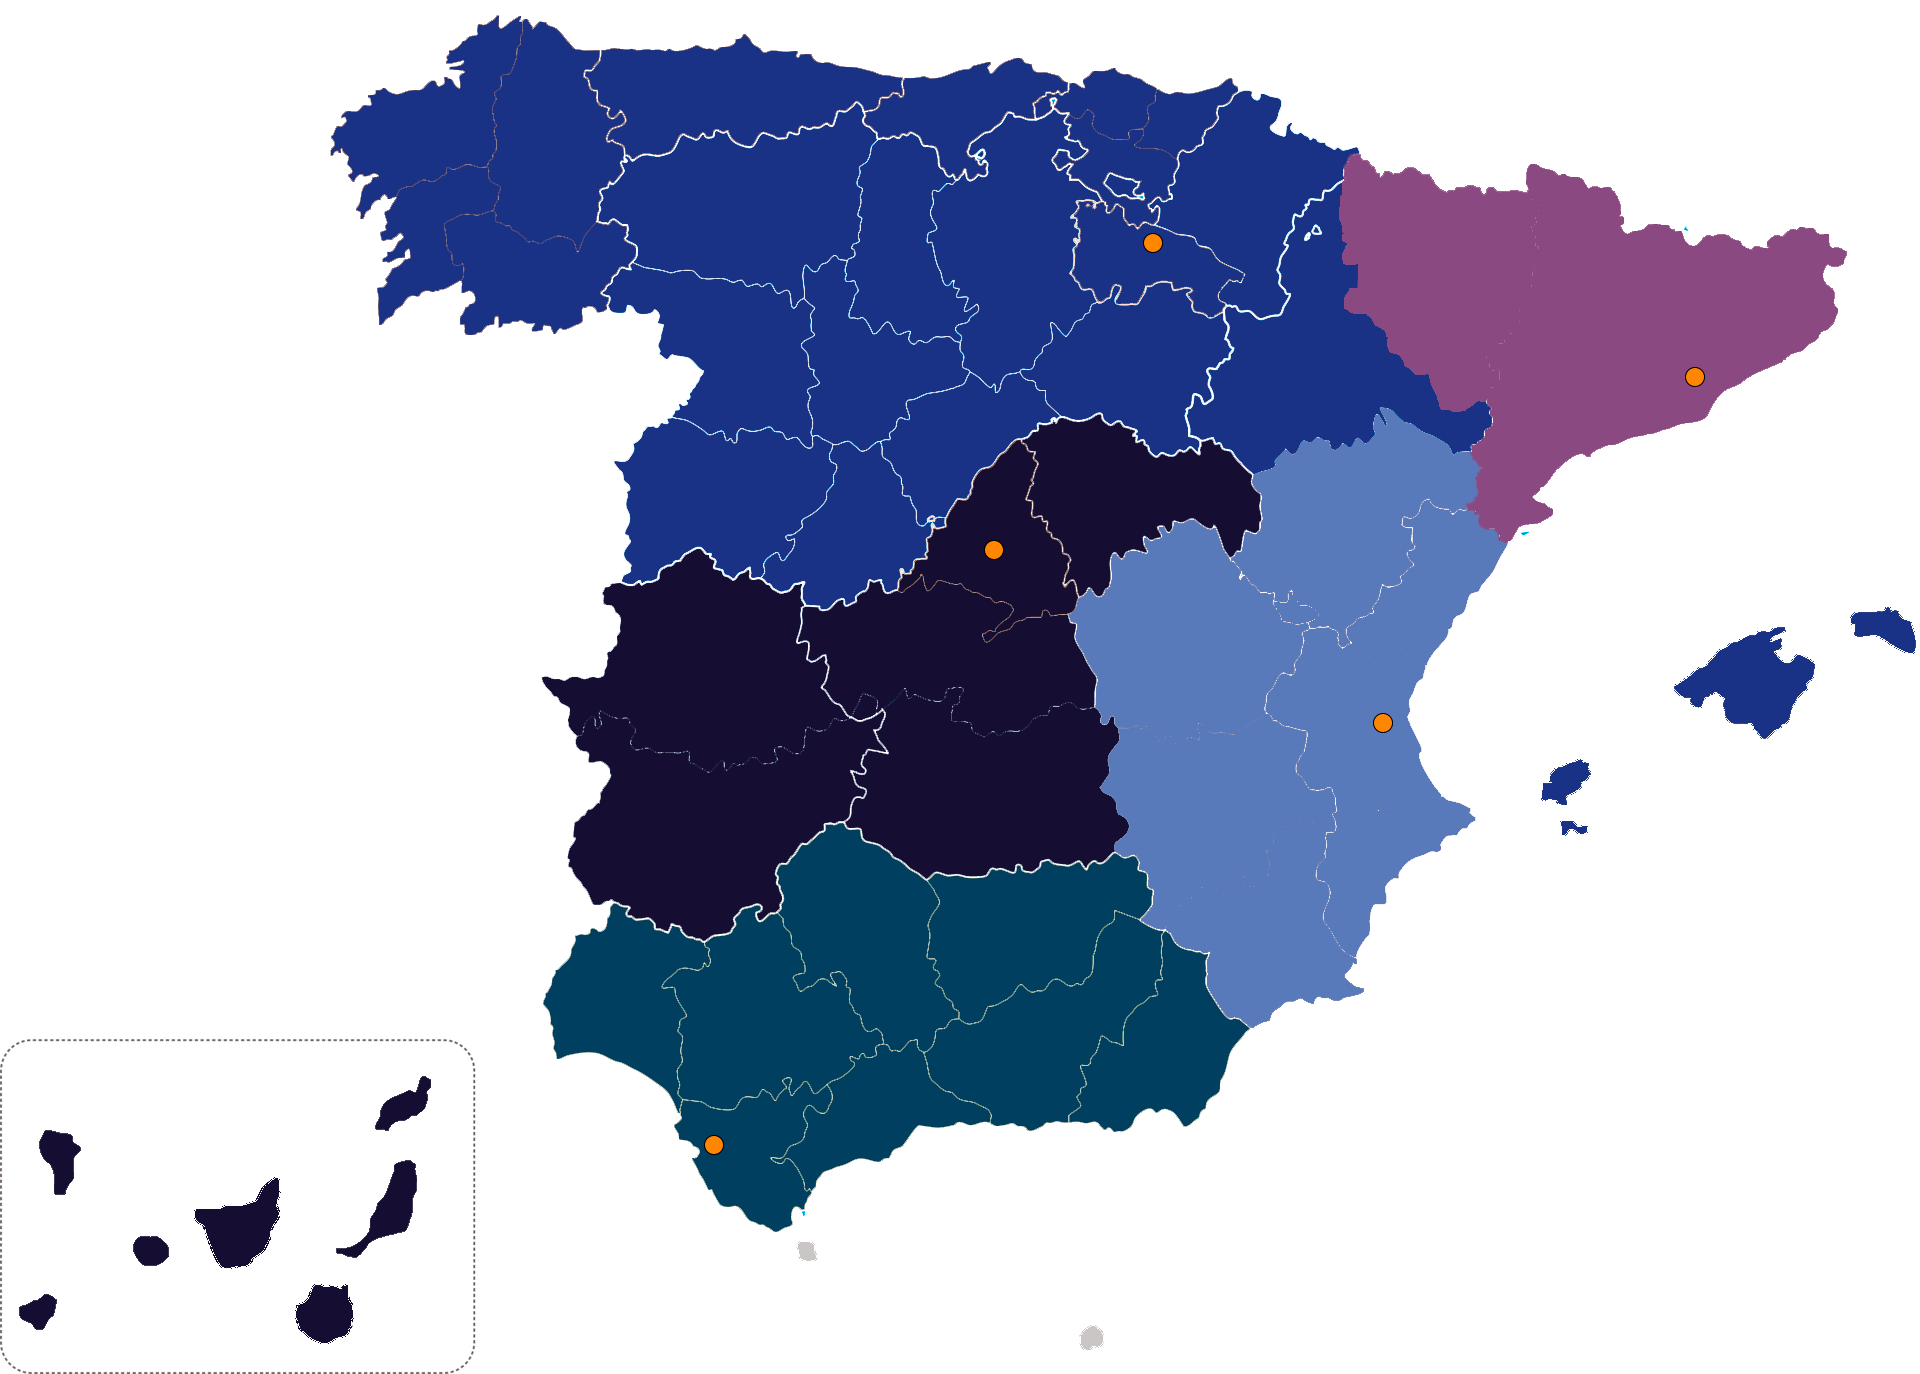 https://www.masscomm.es/sites/default/files/revslider/image/mapa-contacto-v2_0.png